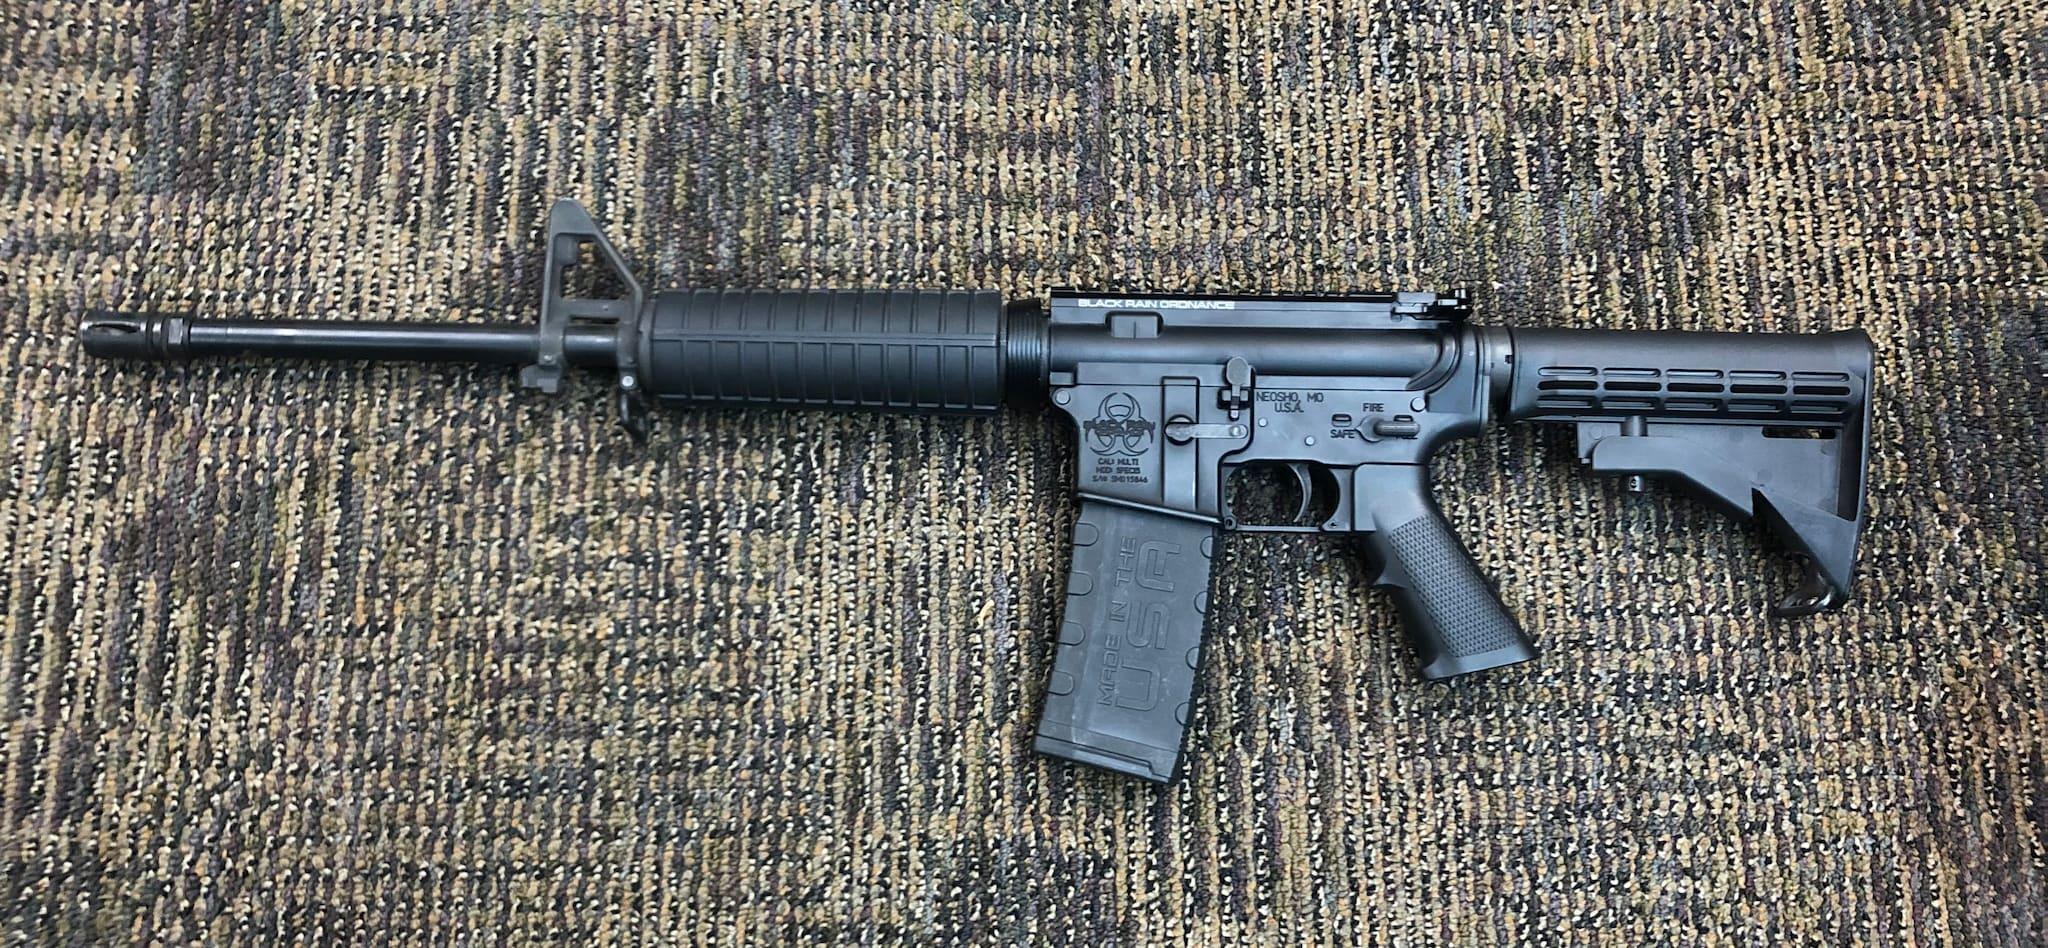 BLACK RAIN ORDNANCE Black Rain Ordnance, SPEC15, Semi-automatic Rifle, 223 Rem/556NATO, 16